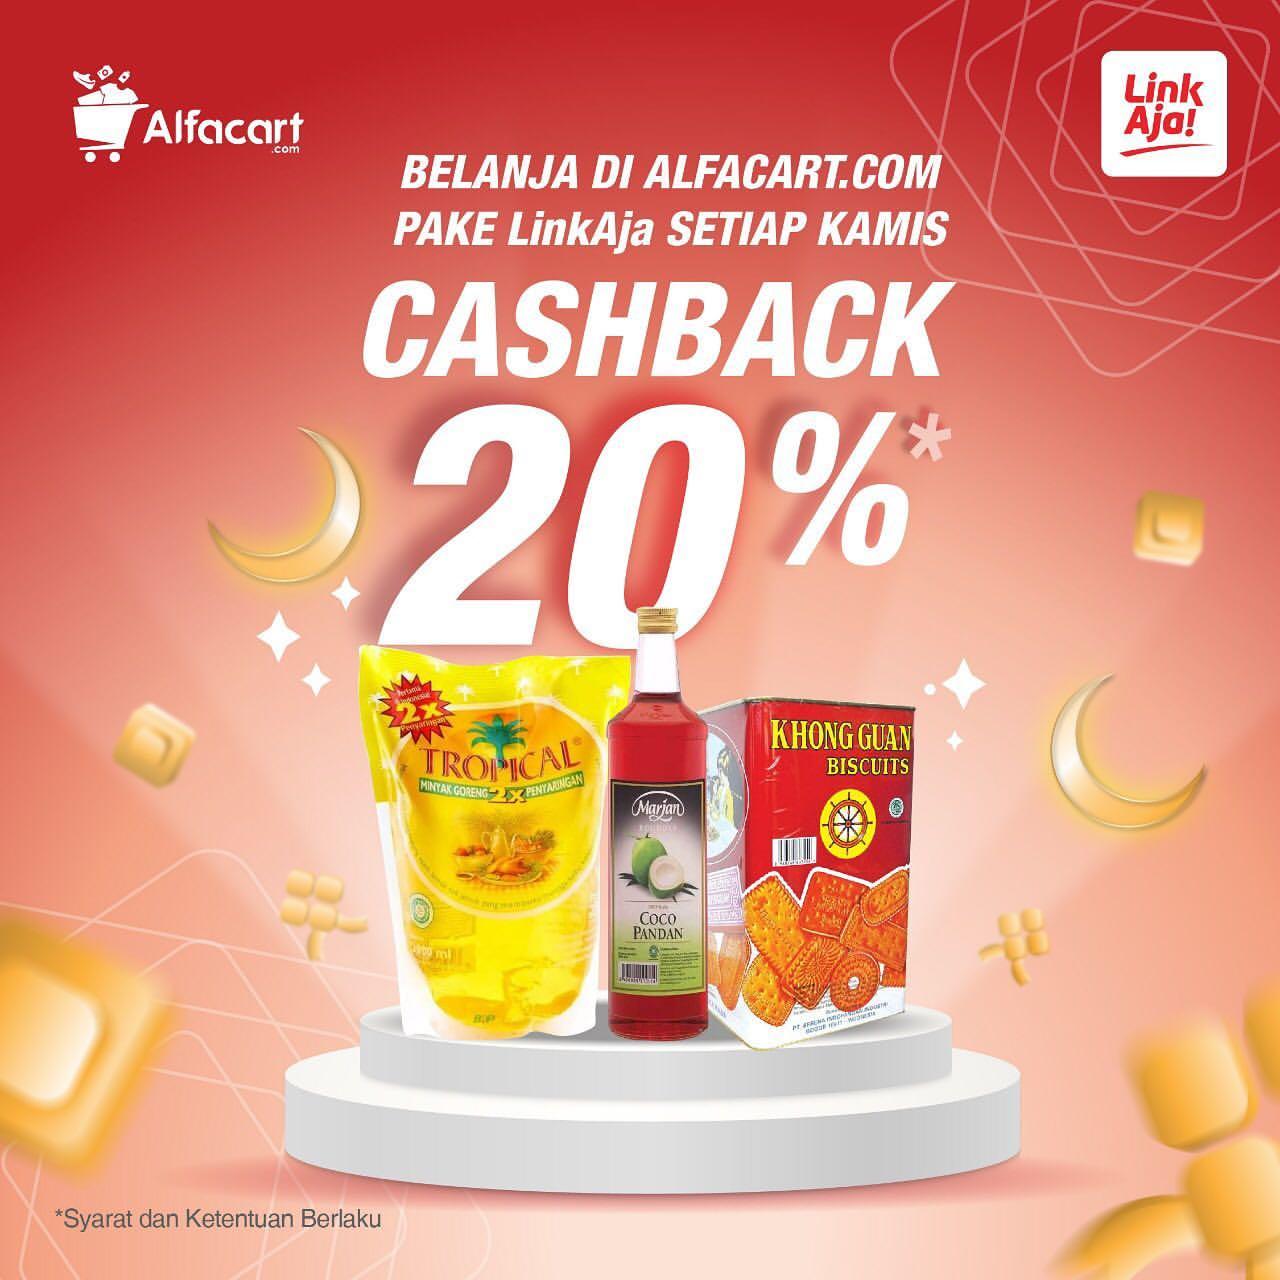 Alfacart Promo Cashback 20% dengan LinkAja